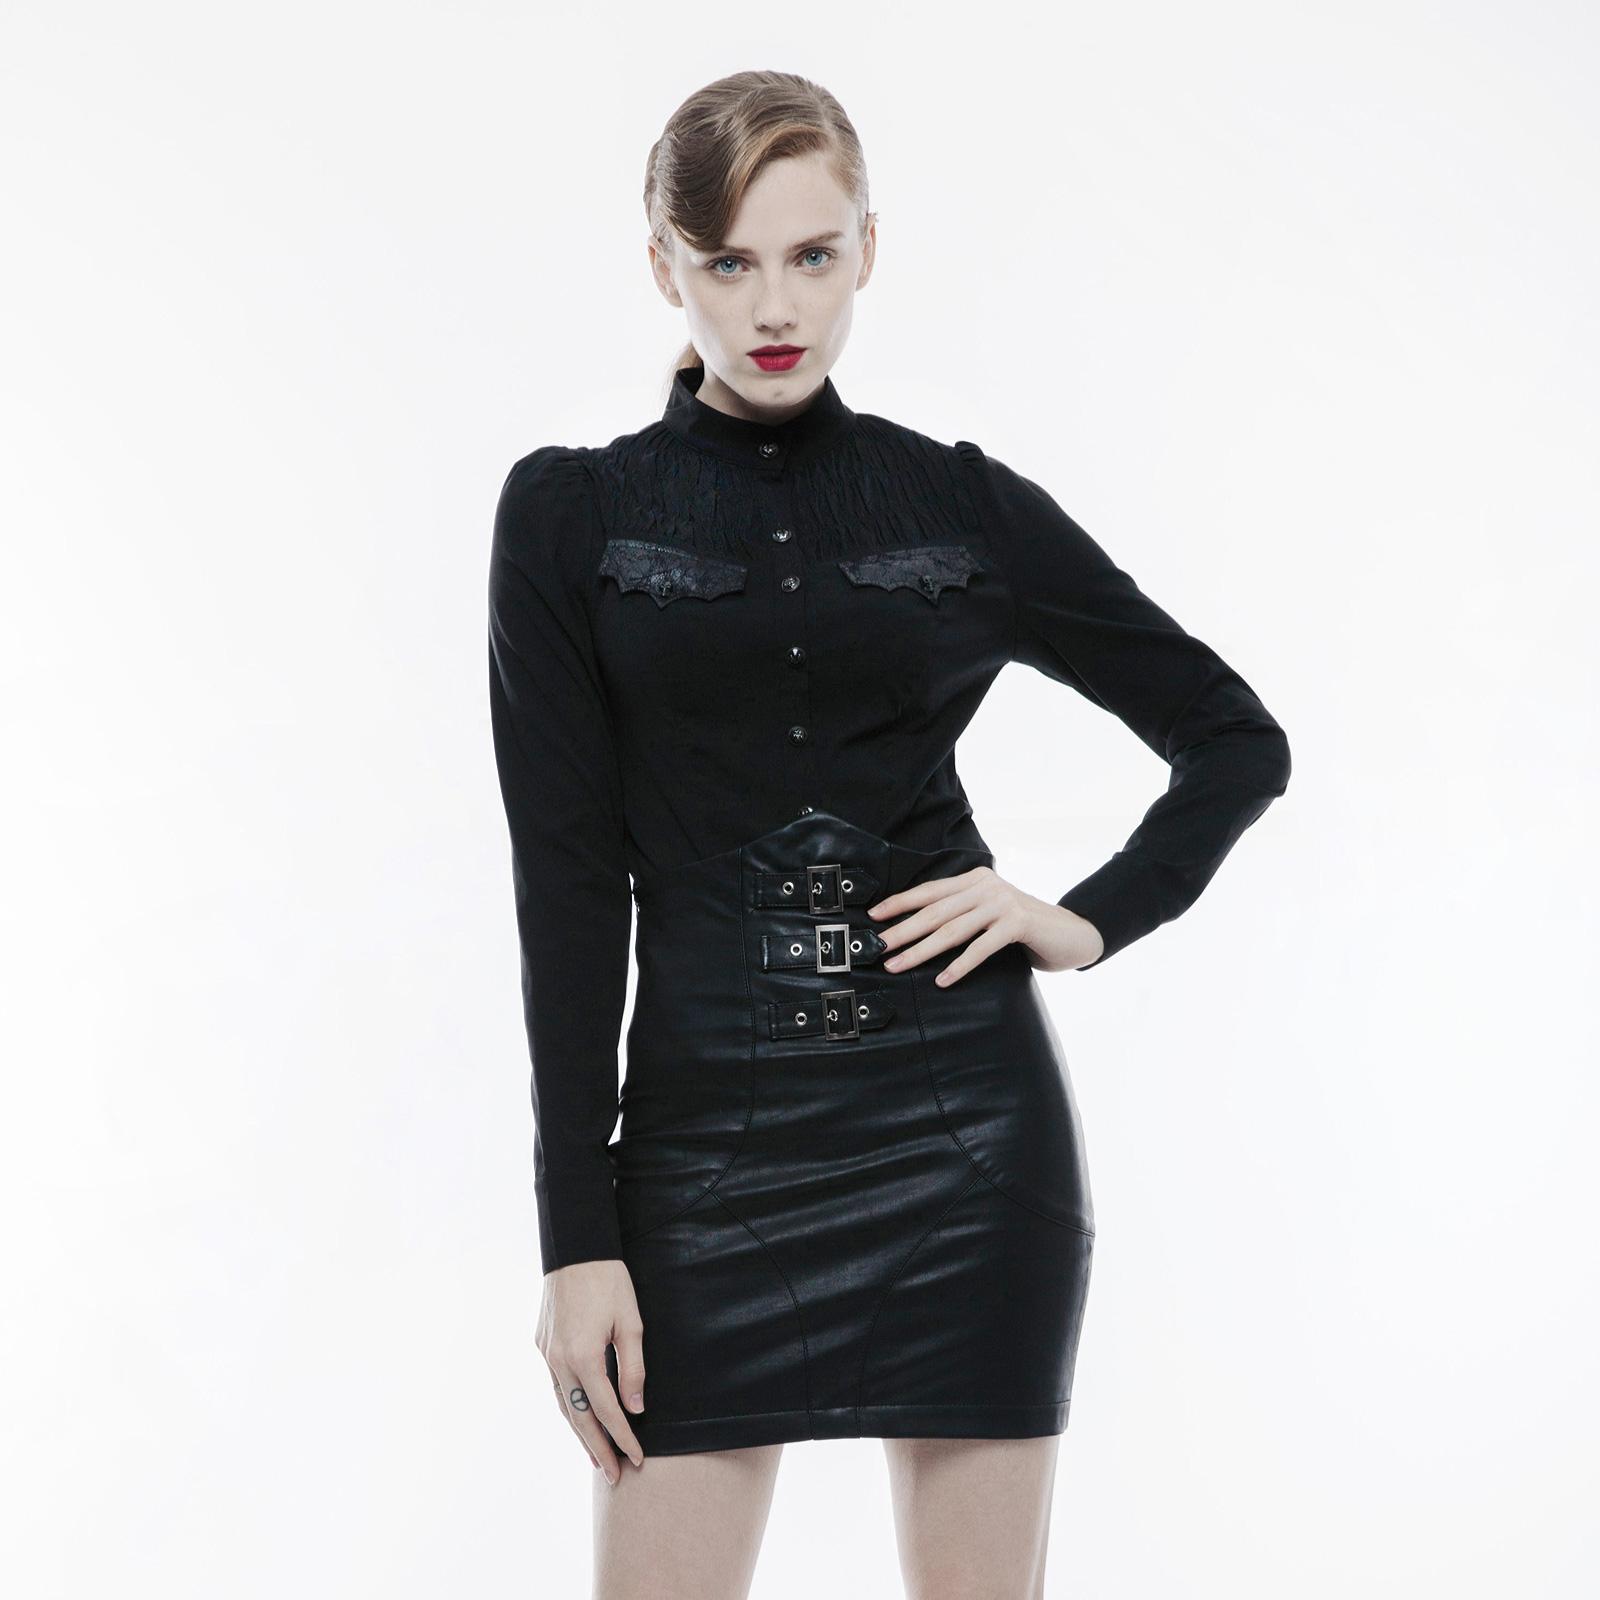 9a6782da6b7ec5 PUNK RAVE Stehkragenbluse Schwarz Gothic-Bluse Damen Gesmokt Blouse ...